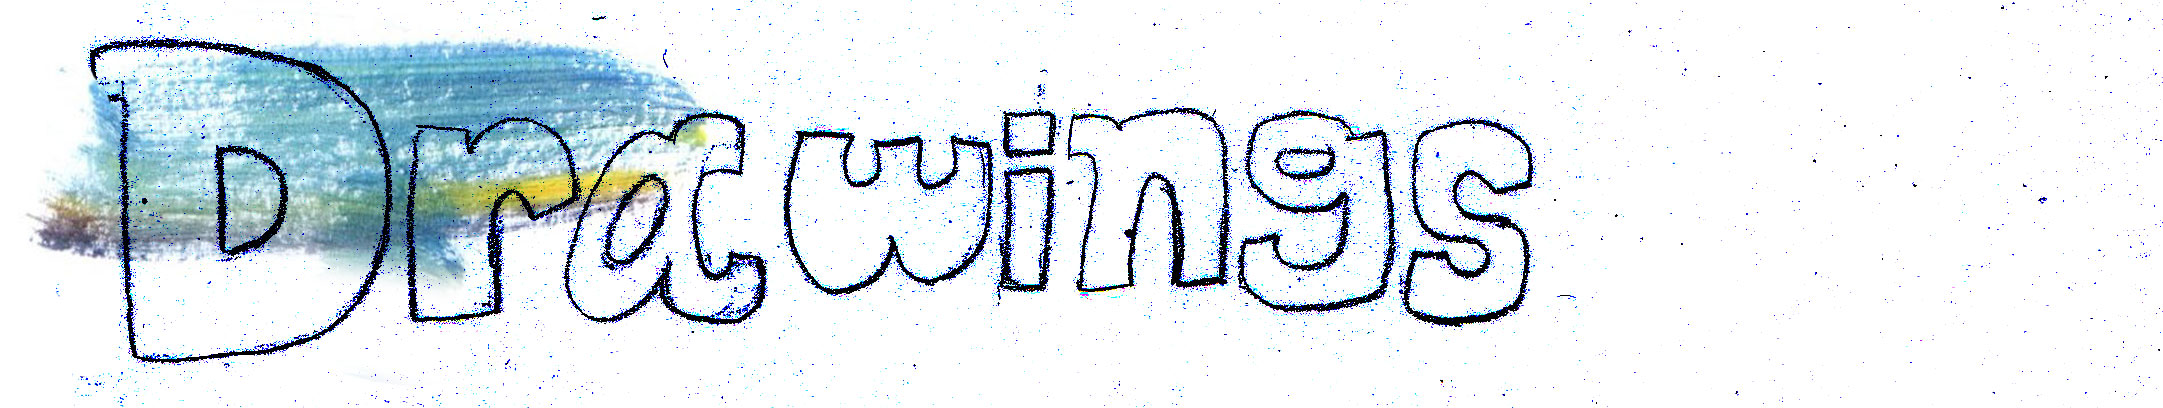 Drawings banner art monk website